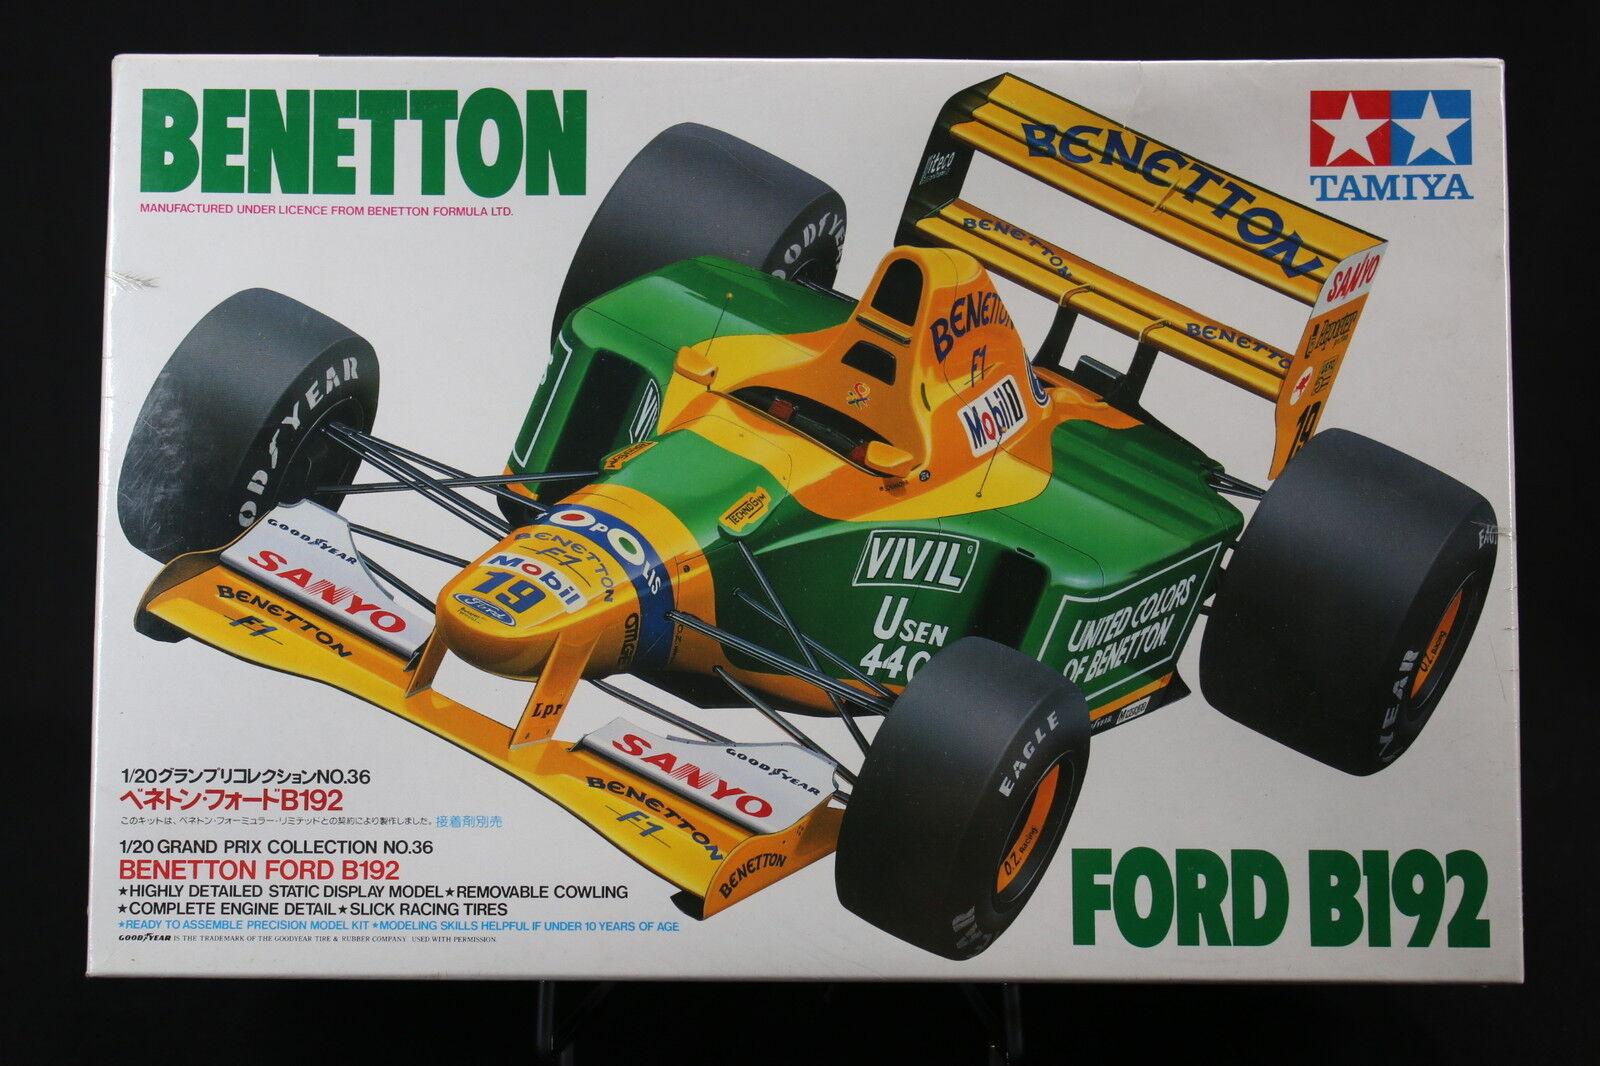 XC014 TAMIYA 1/20 maquette F1 F1 F1 20036 BENETTON ford B192 Mobil 1992 Schumacher | Se Vendant Bien Partout Dans Le Monde  6b4da7